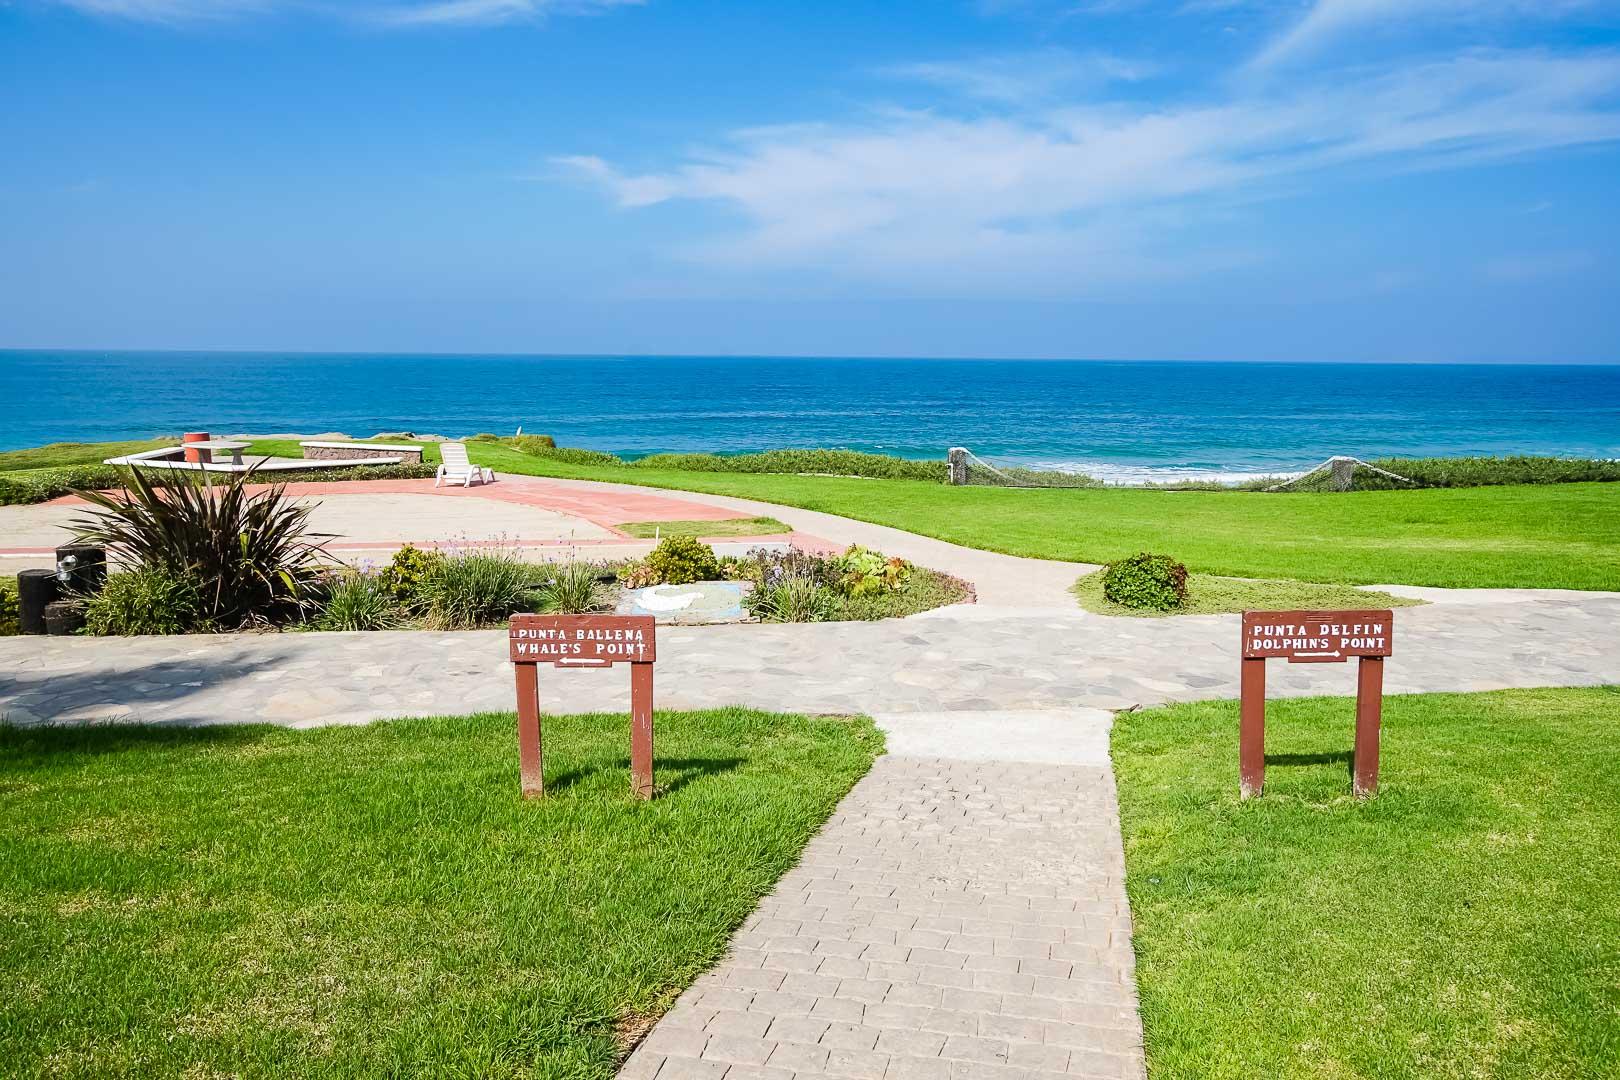 La Paloma - Ocean view